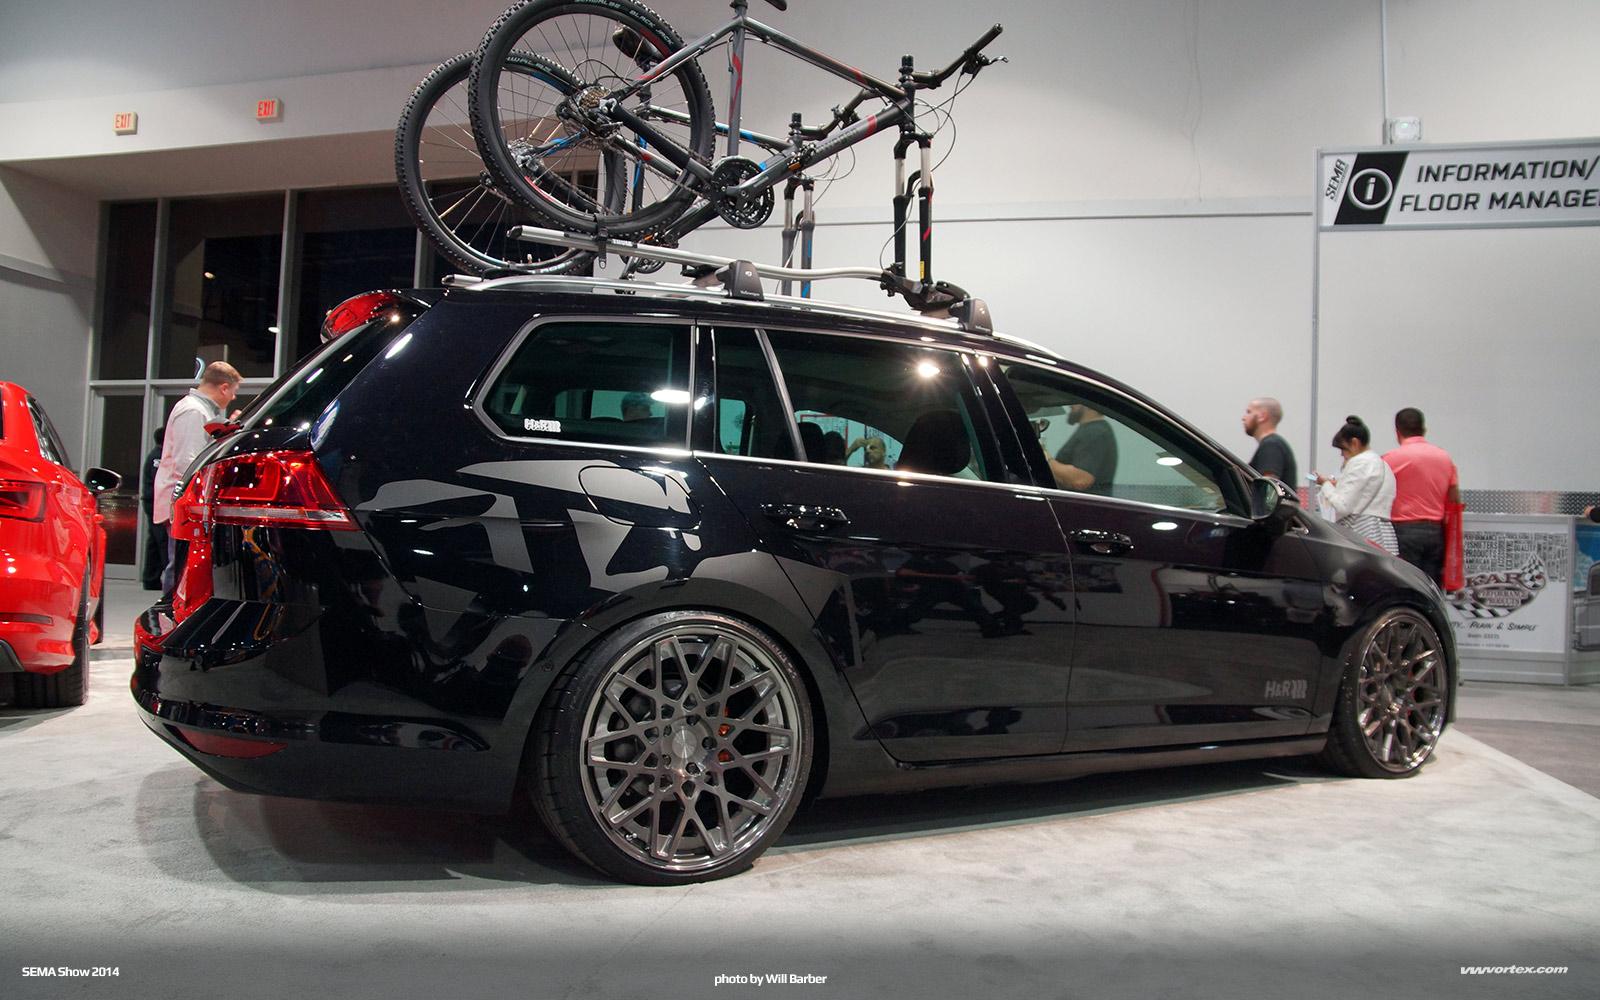 2014-SEMA-Show-VW-1206.jpg